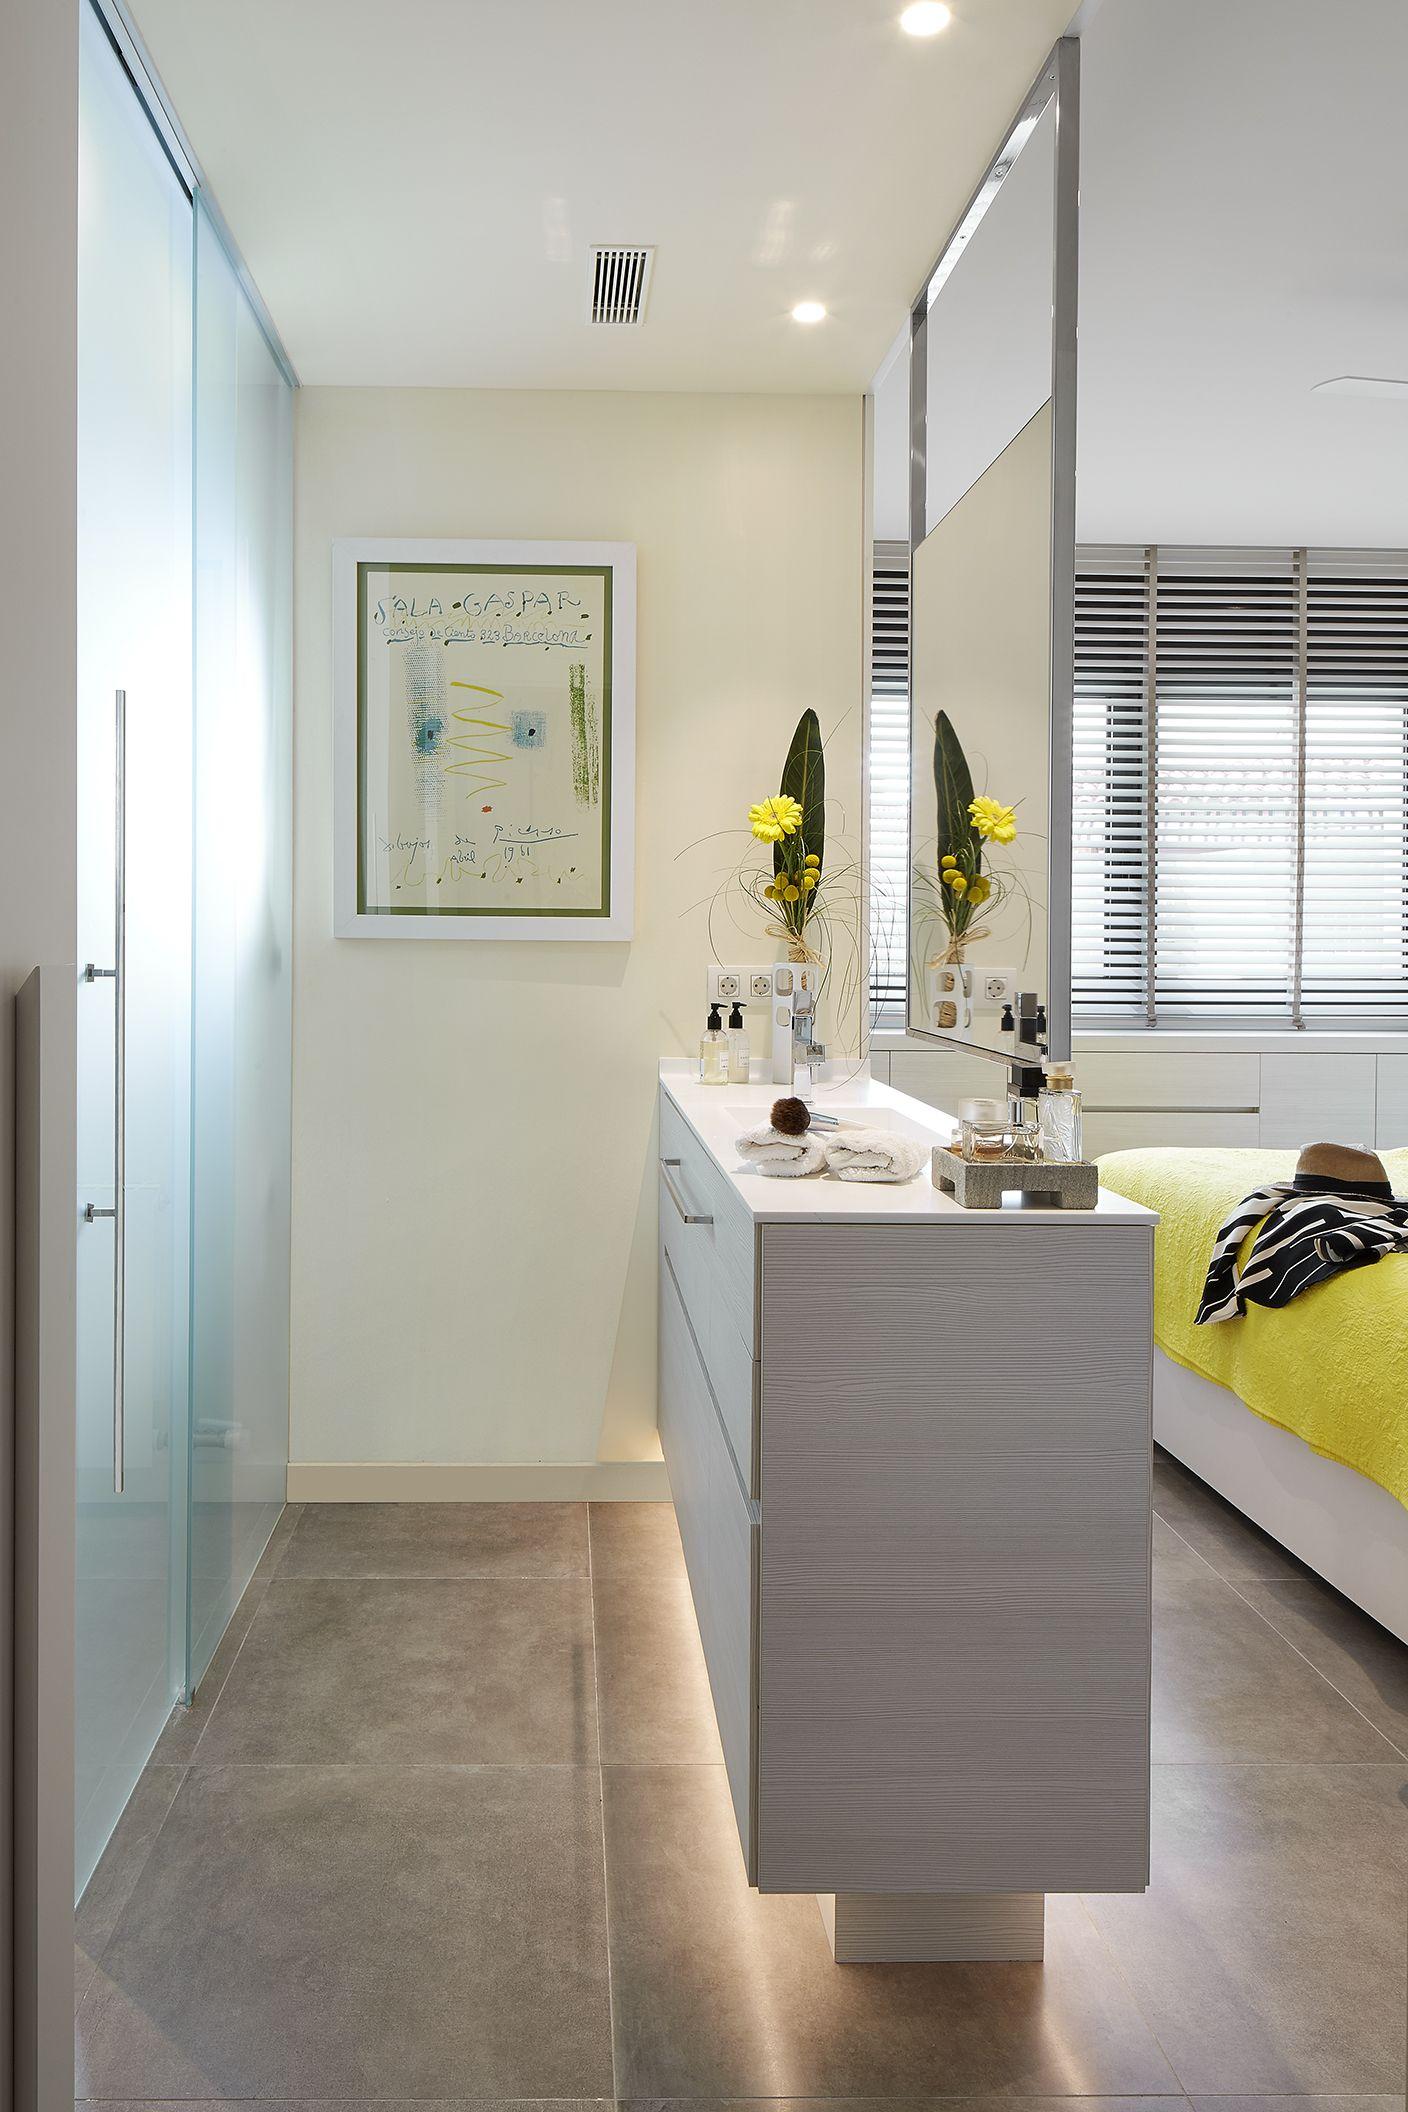 Molins interiors arquitectura interior interiorismo - Diseno cuartos de bano pequenos ...